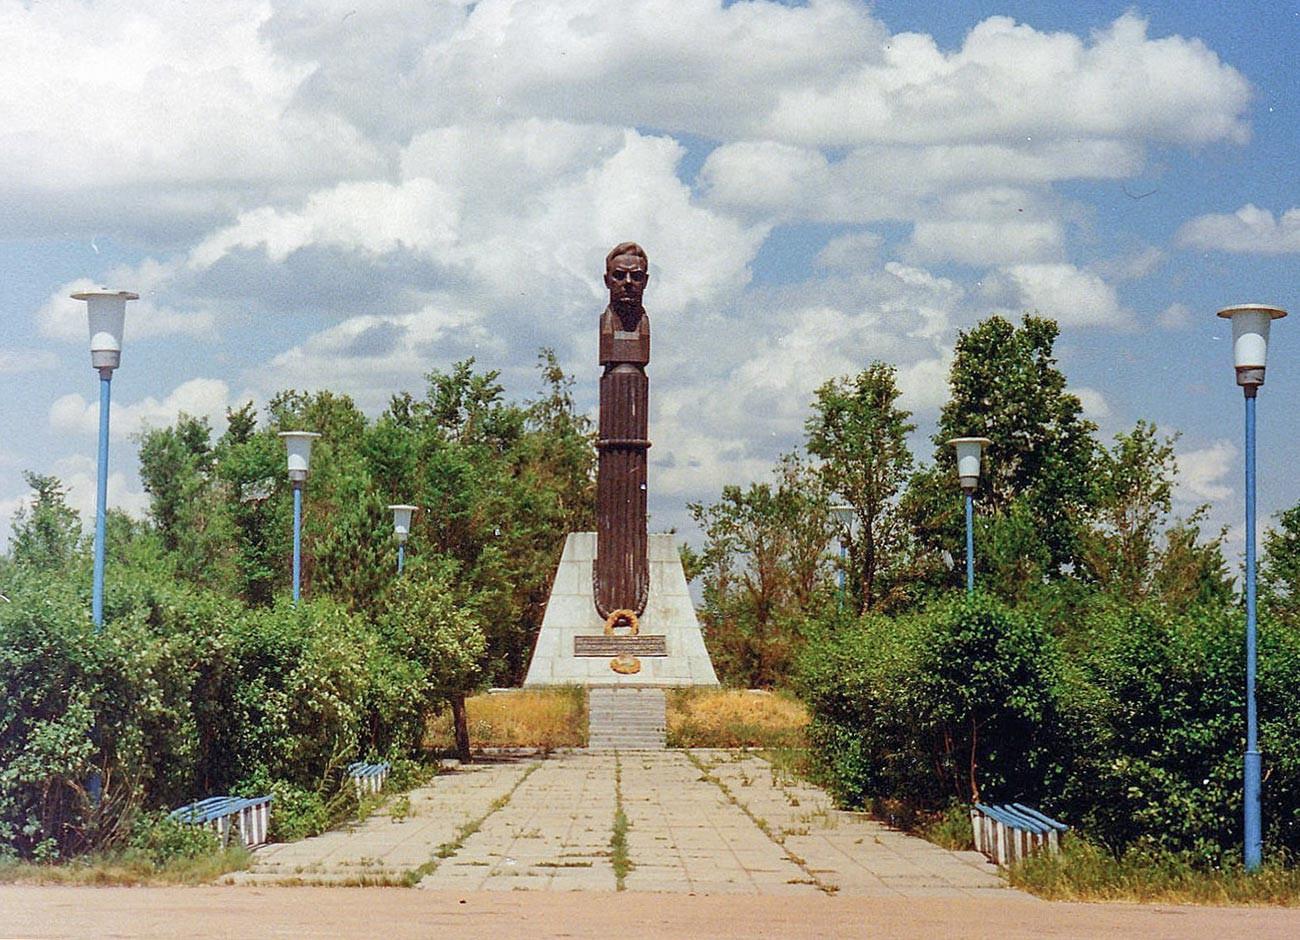 Monumen untuk mengenang Vladimir Komarov.